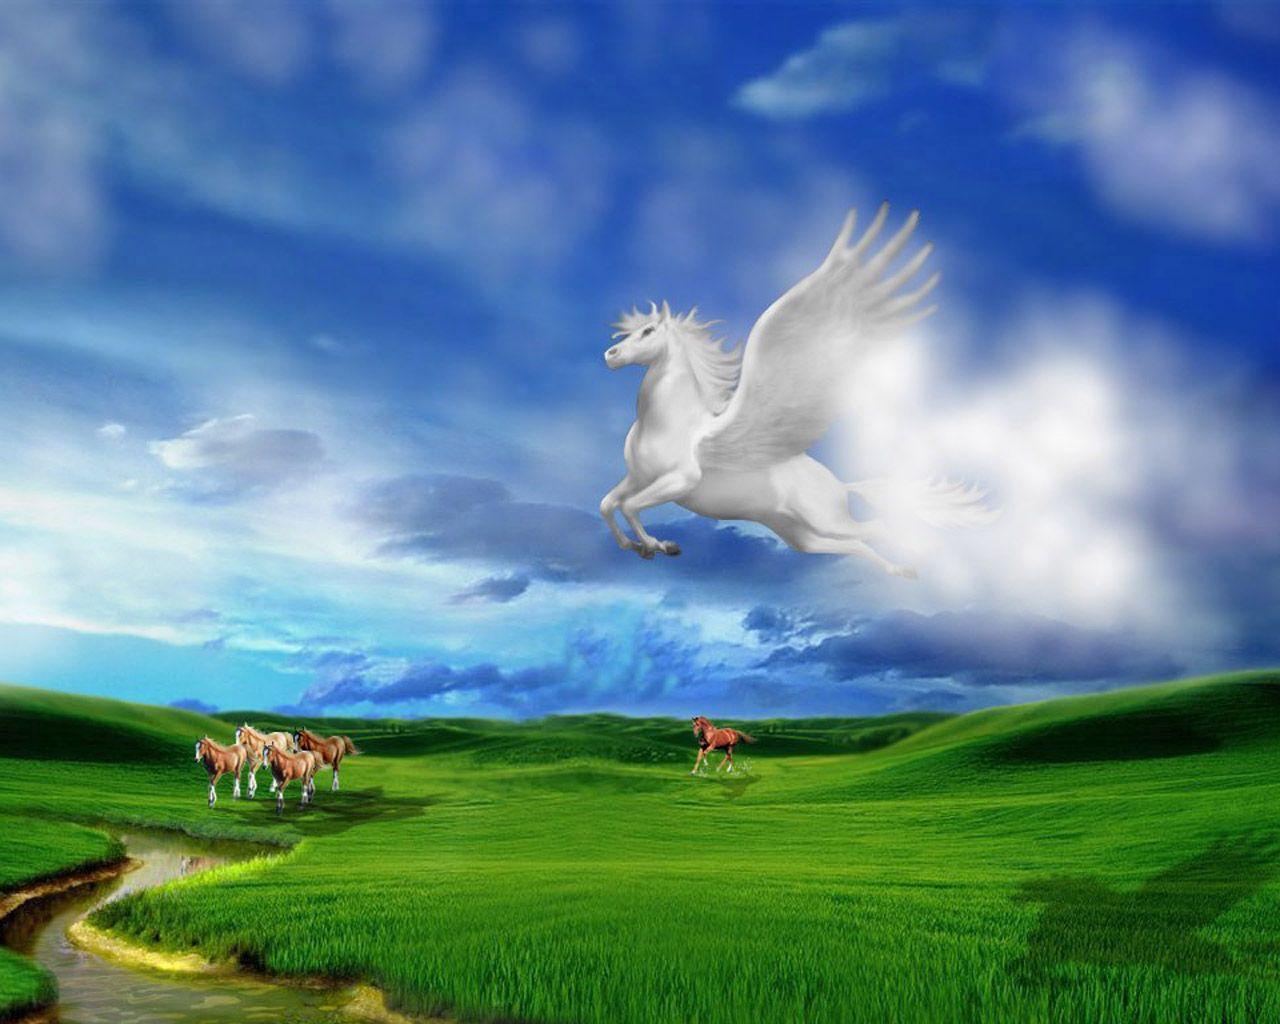 Pegasus Desktop Backgrounds HD Wallpaper 3D Abstract Wallpapers 1280x1024